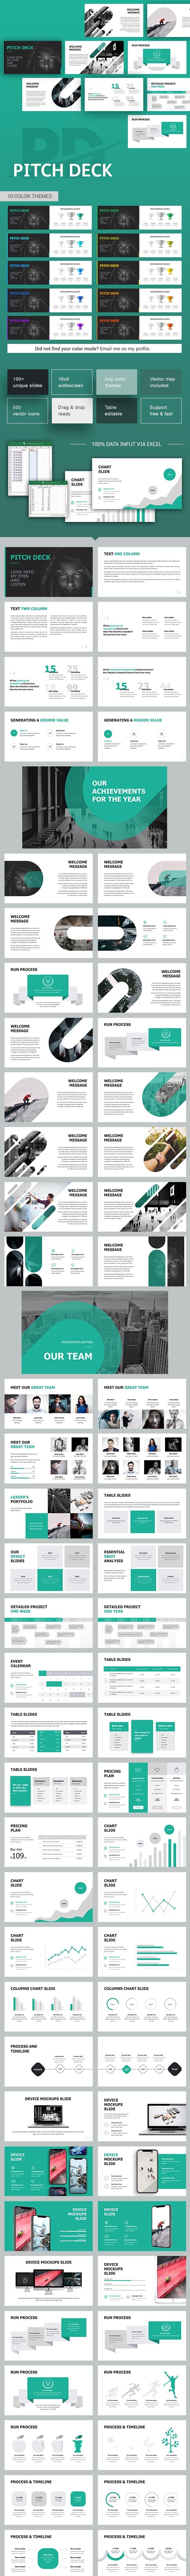 Pitch Deck PowerPoint - Pitch Deck PowerPoint Templates